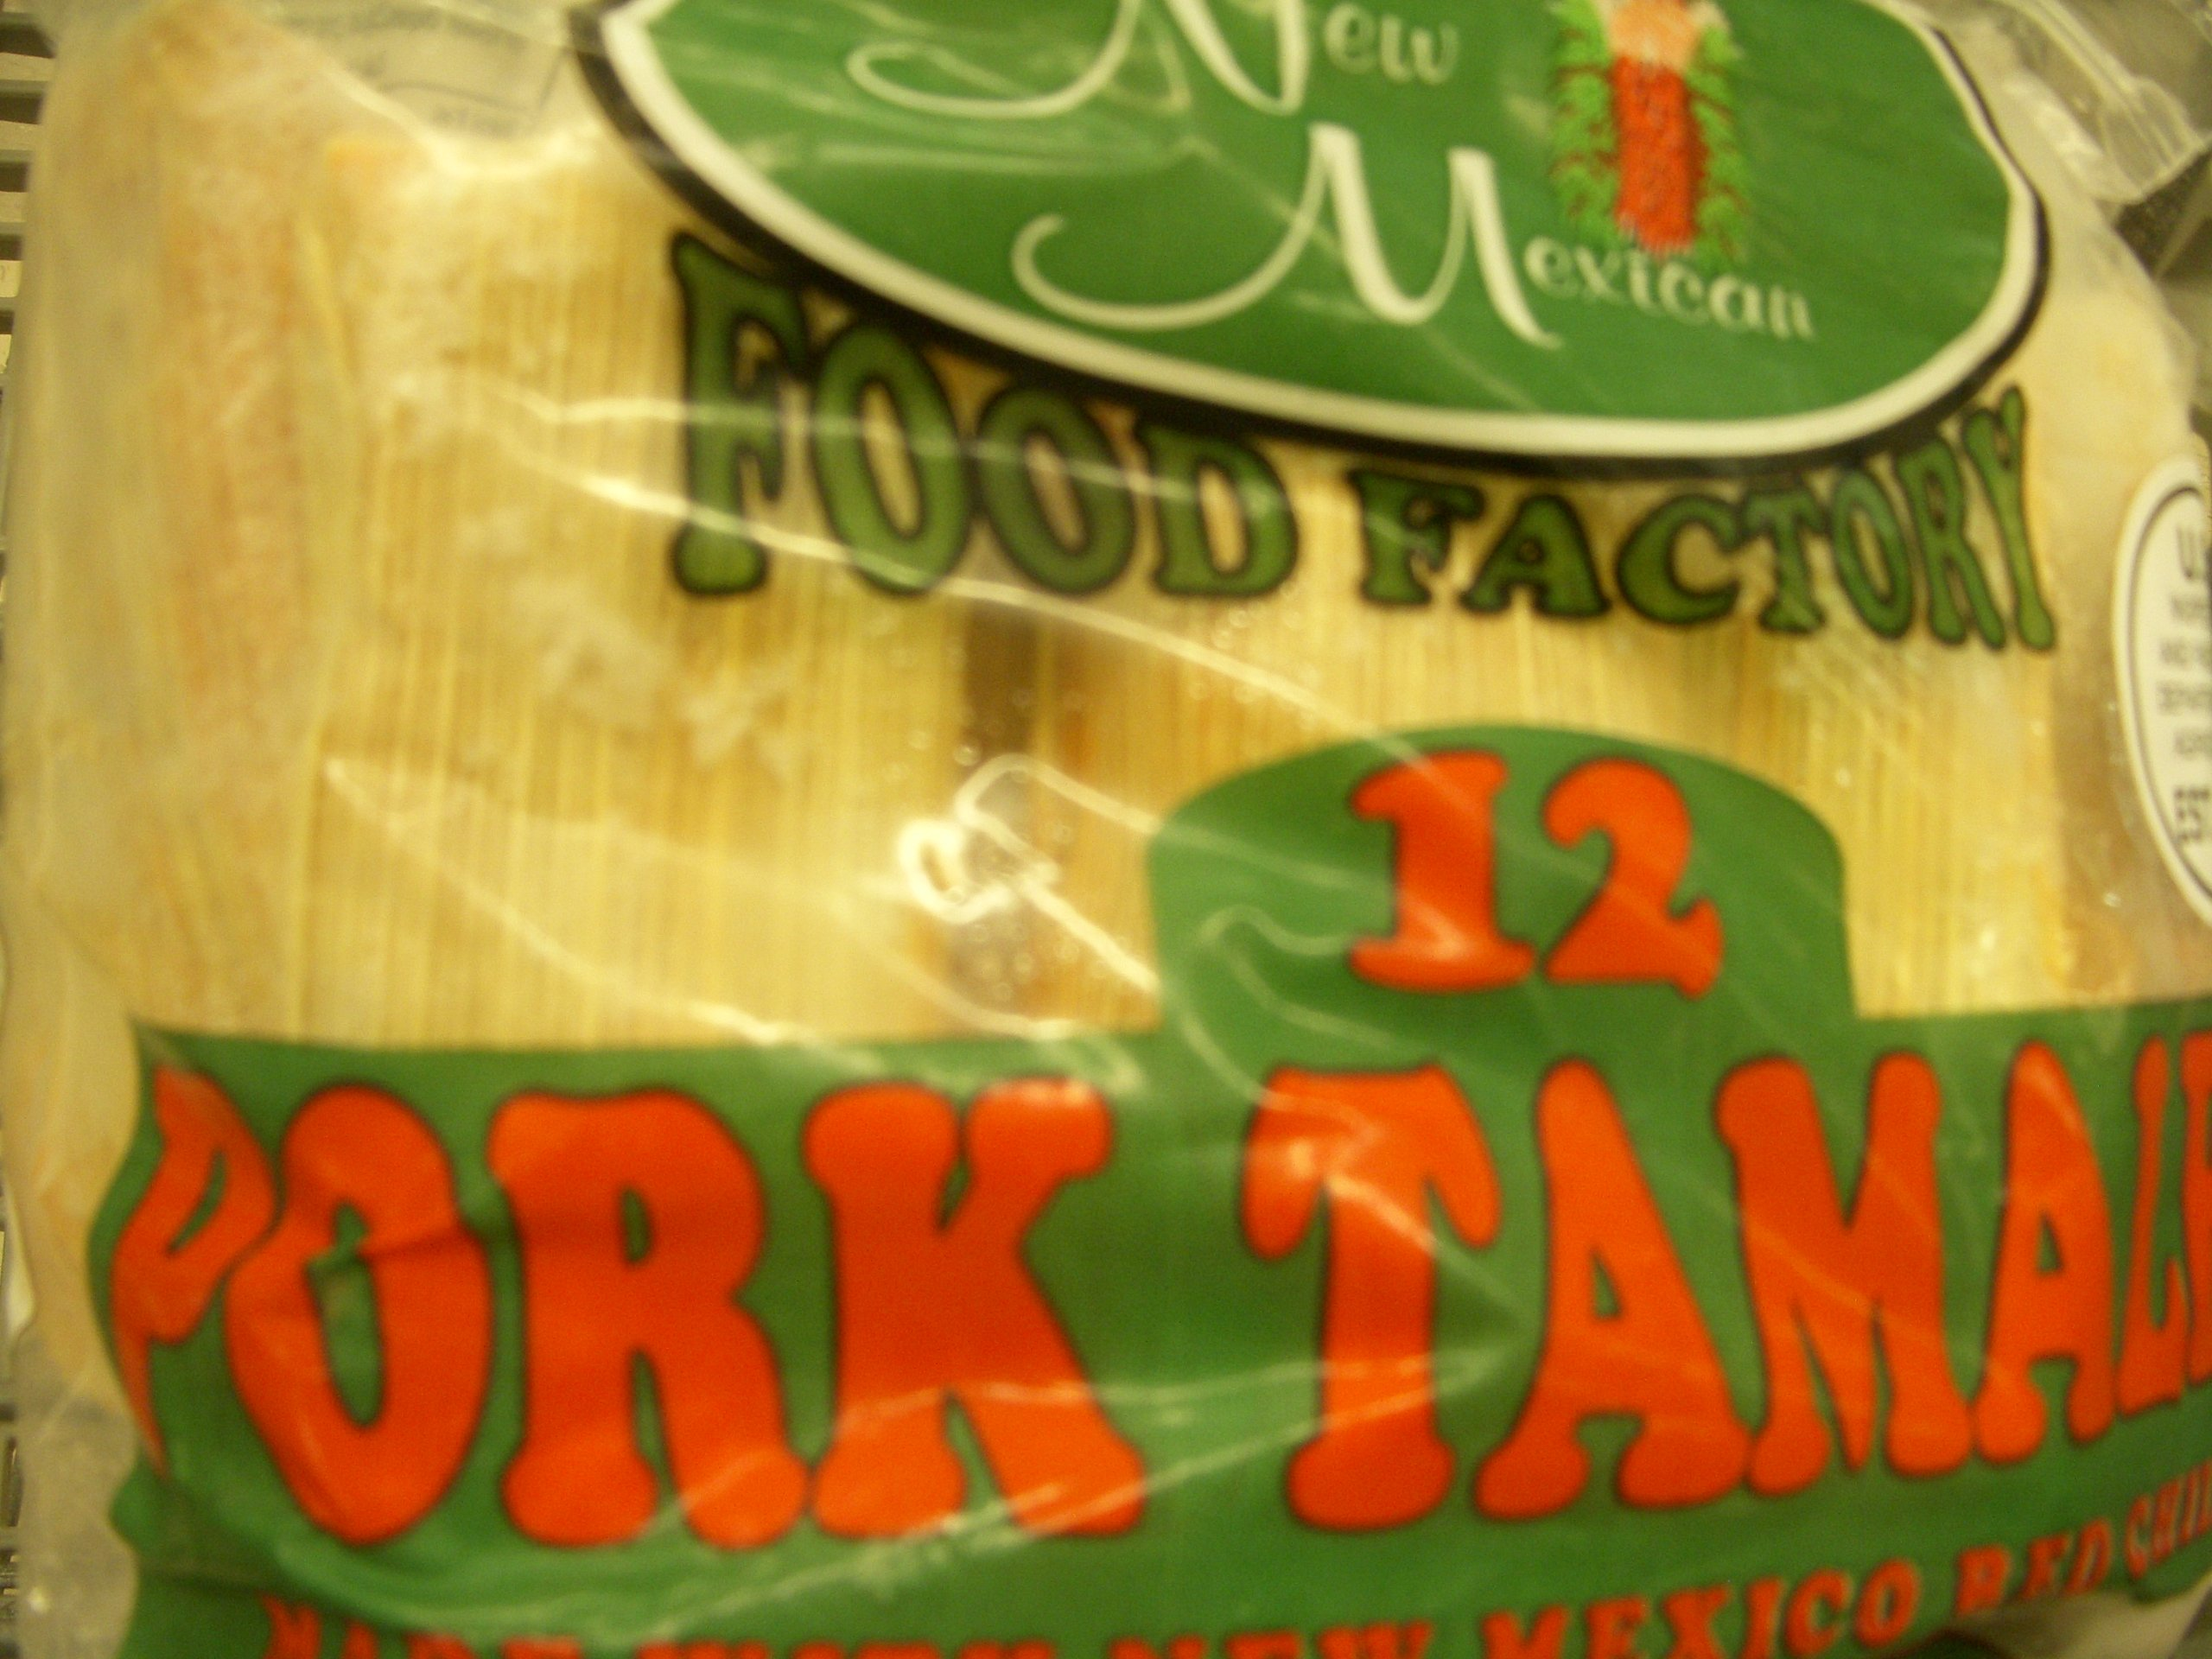 2 Dozen New Mexican Red Chile Pork Tamales